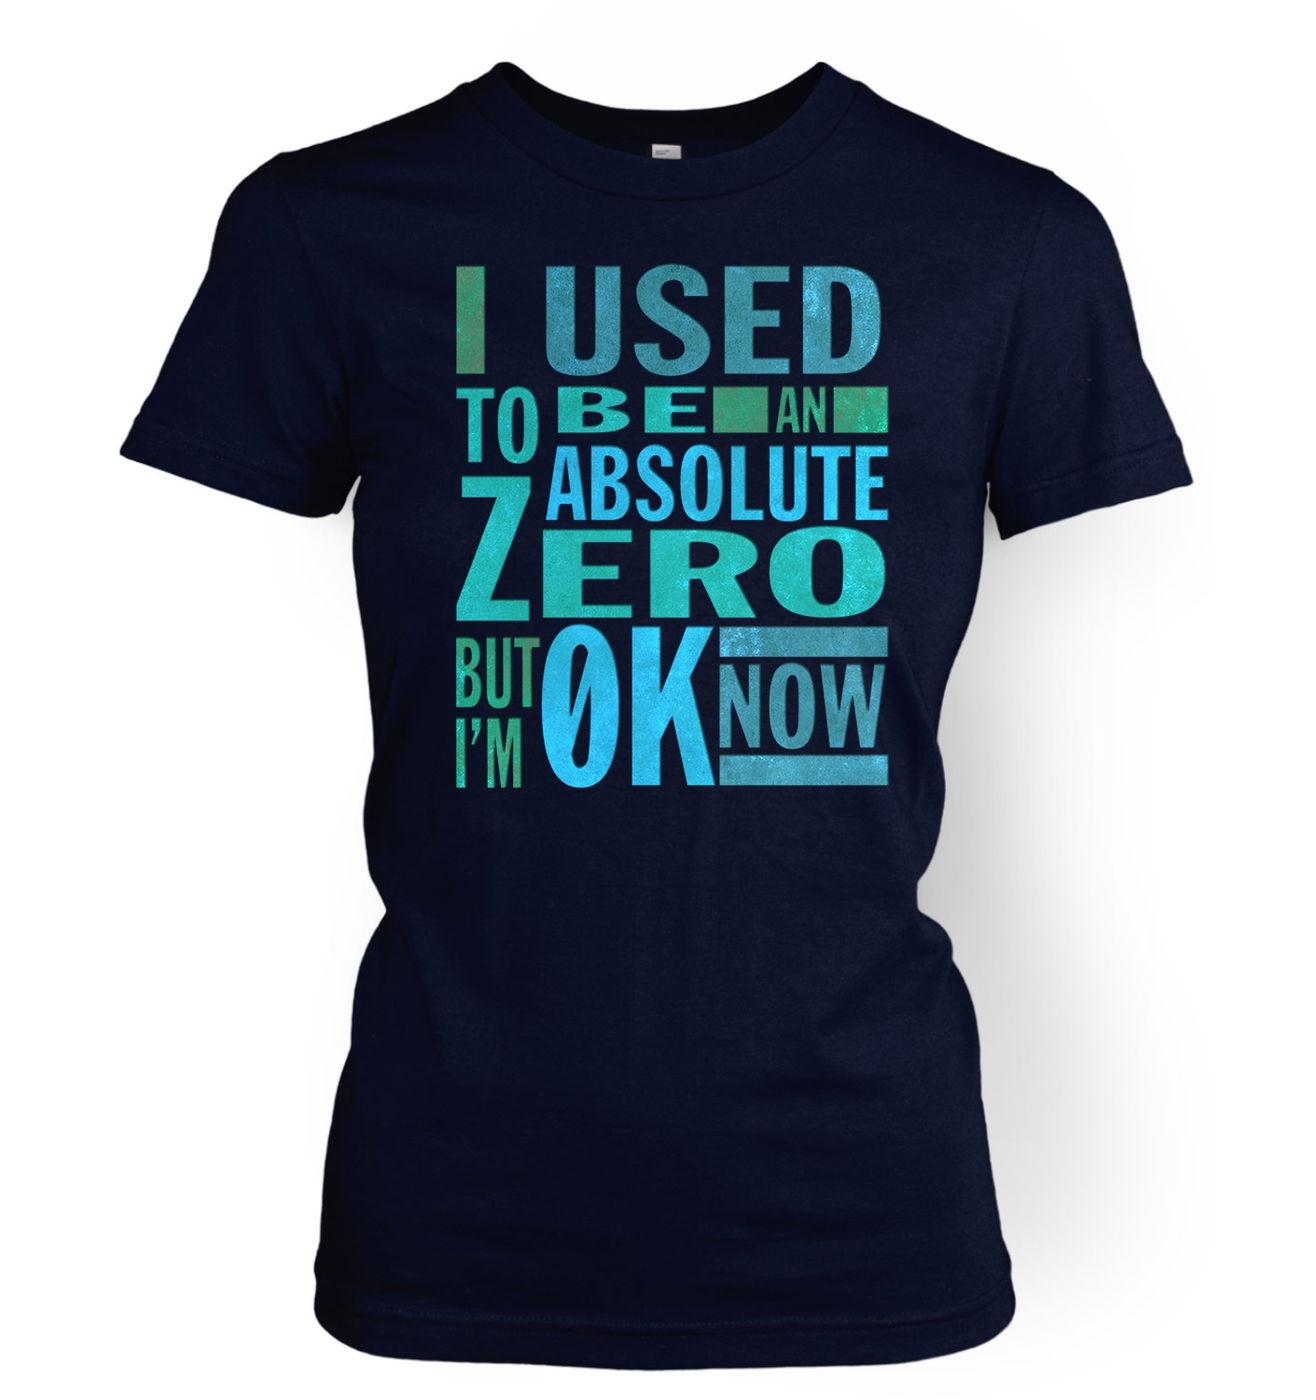 Absolute Zero 0K Now women's t-shirt - funny science slogan women's tshirt